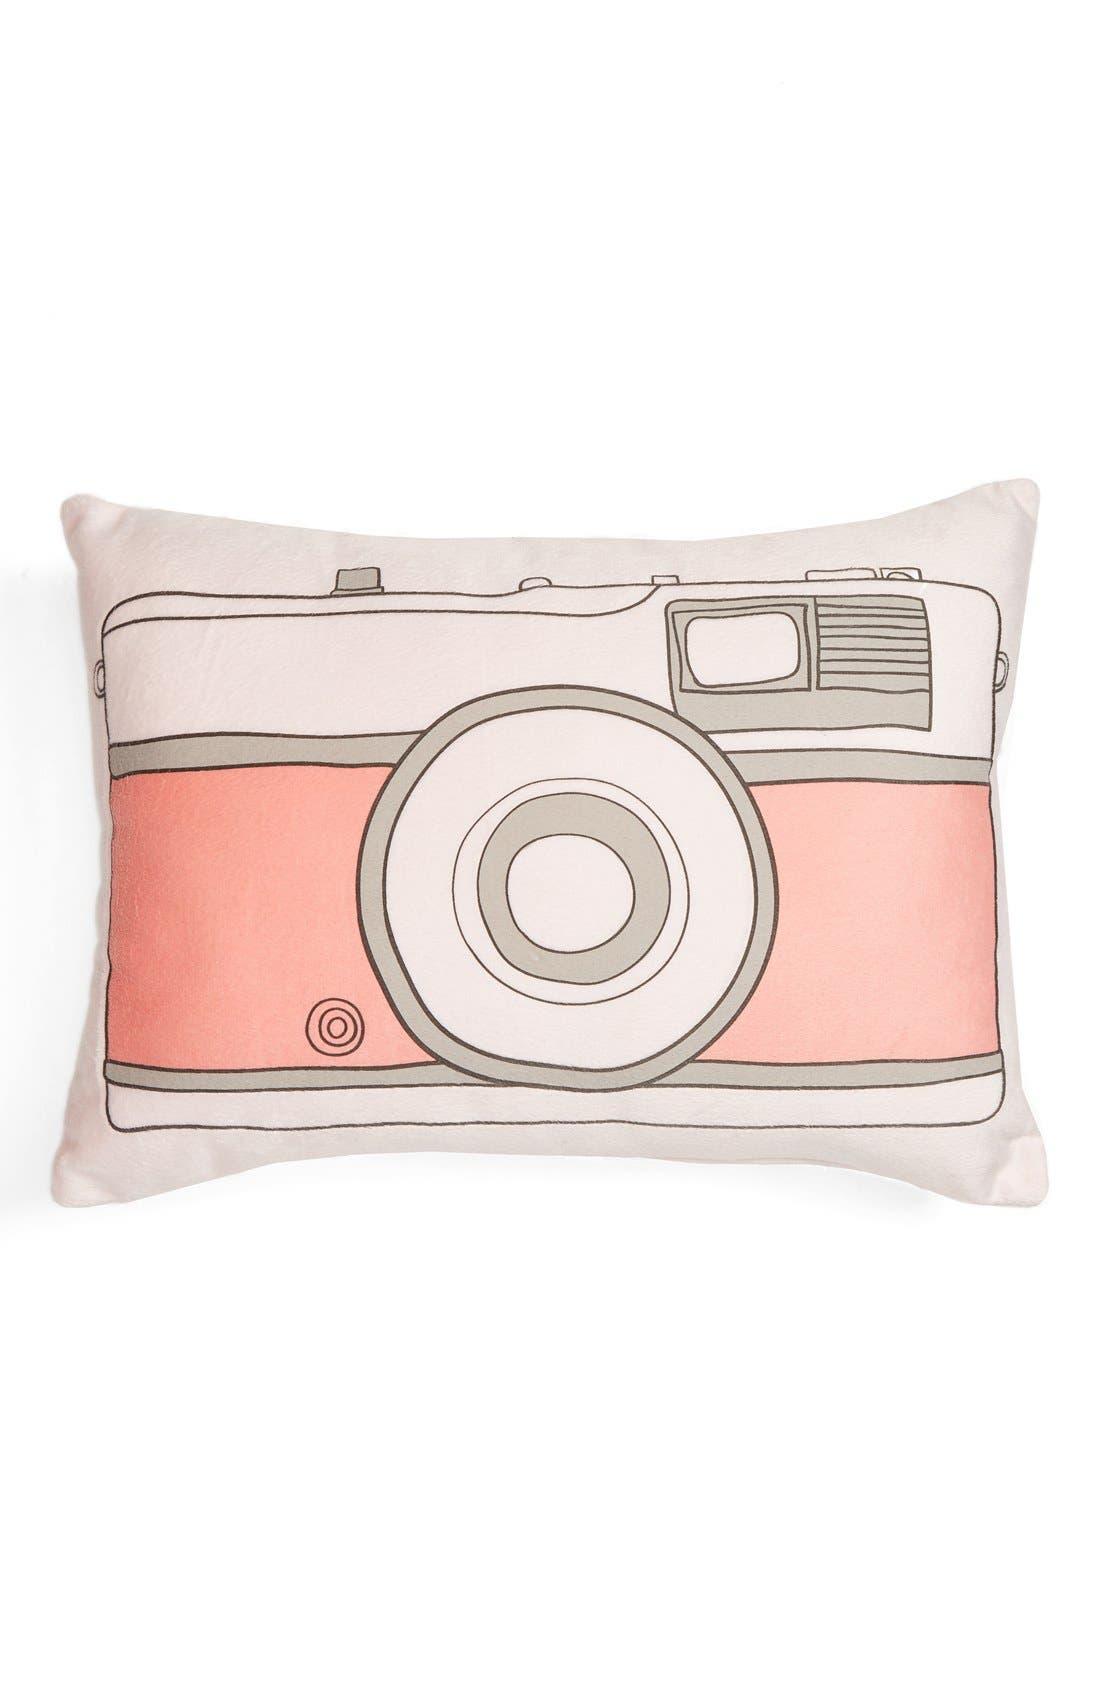 Capelli of New York Camera Pillow,                         Main,                         color, 690